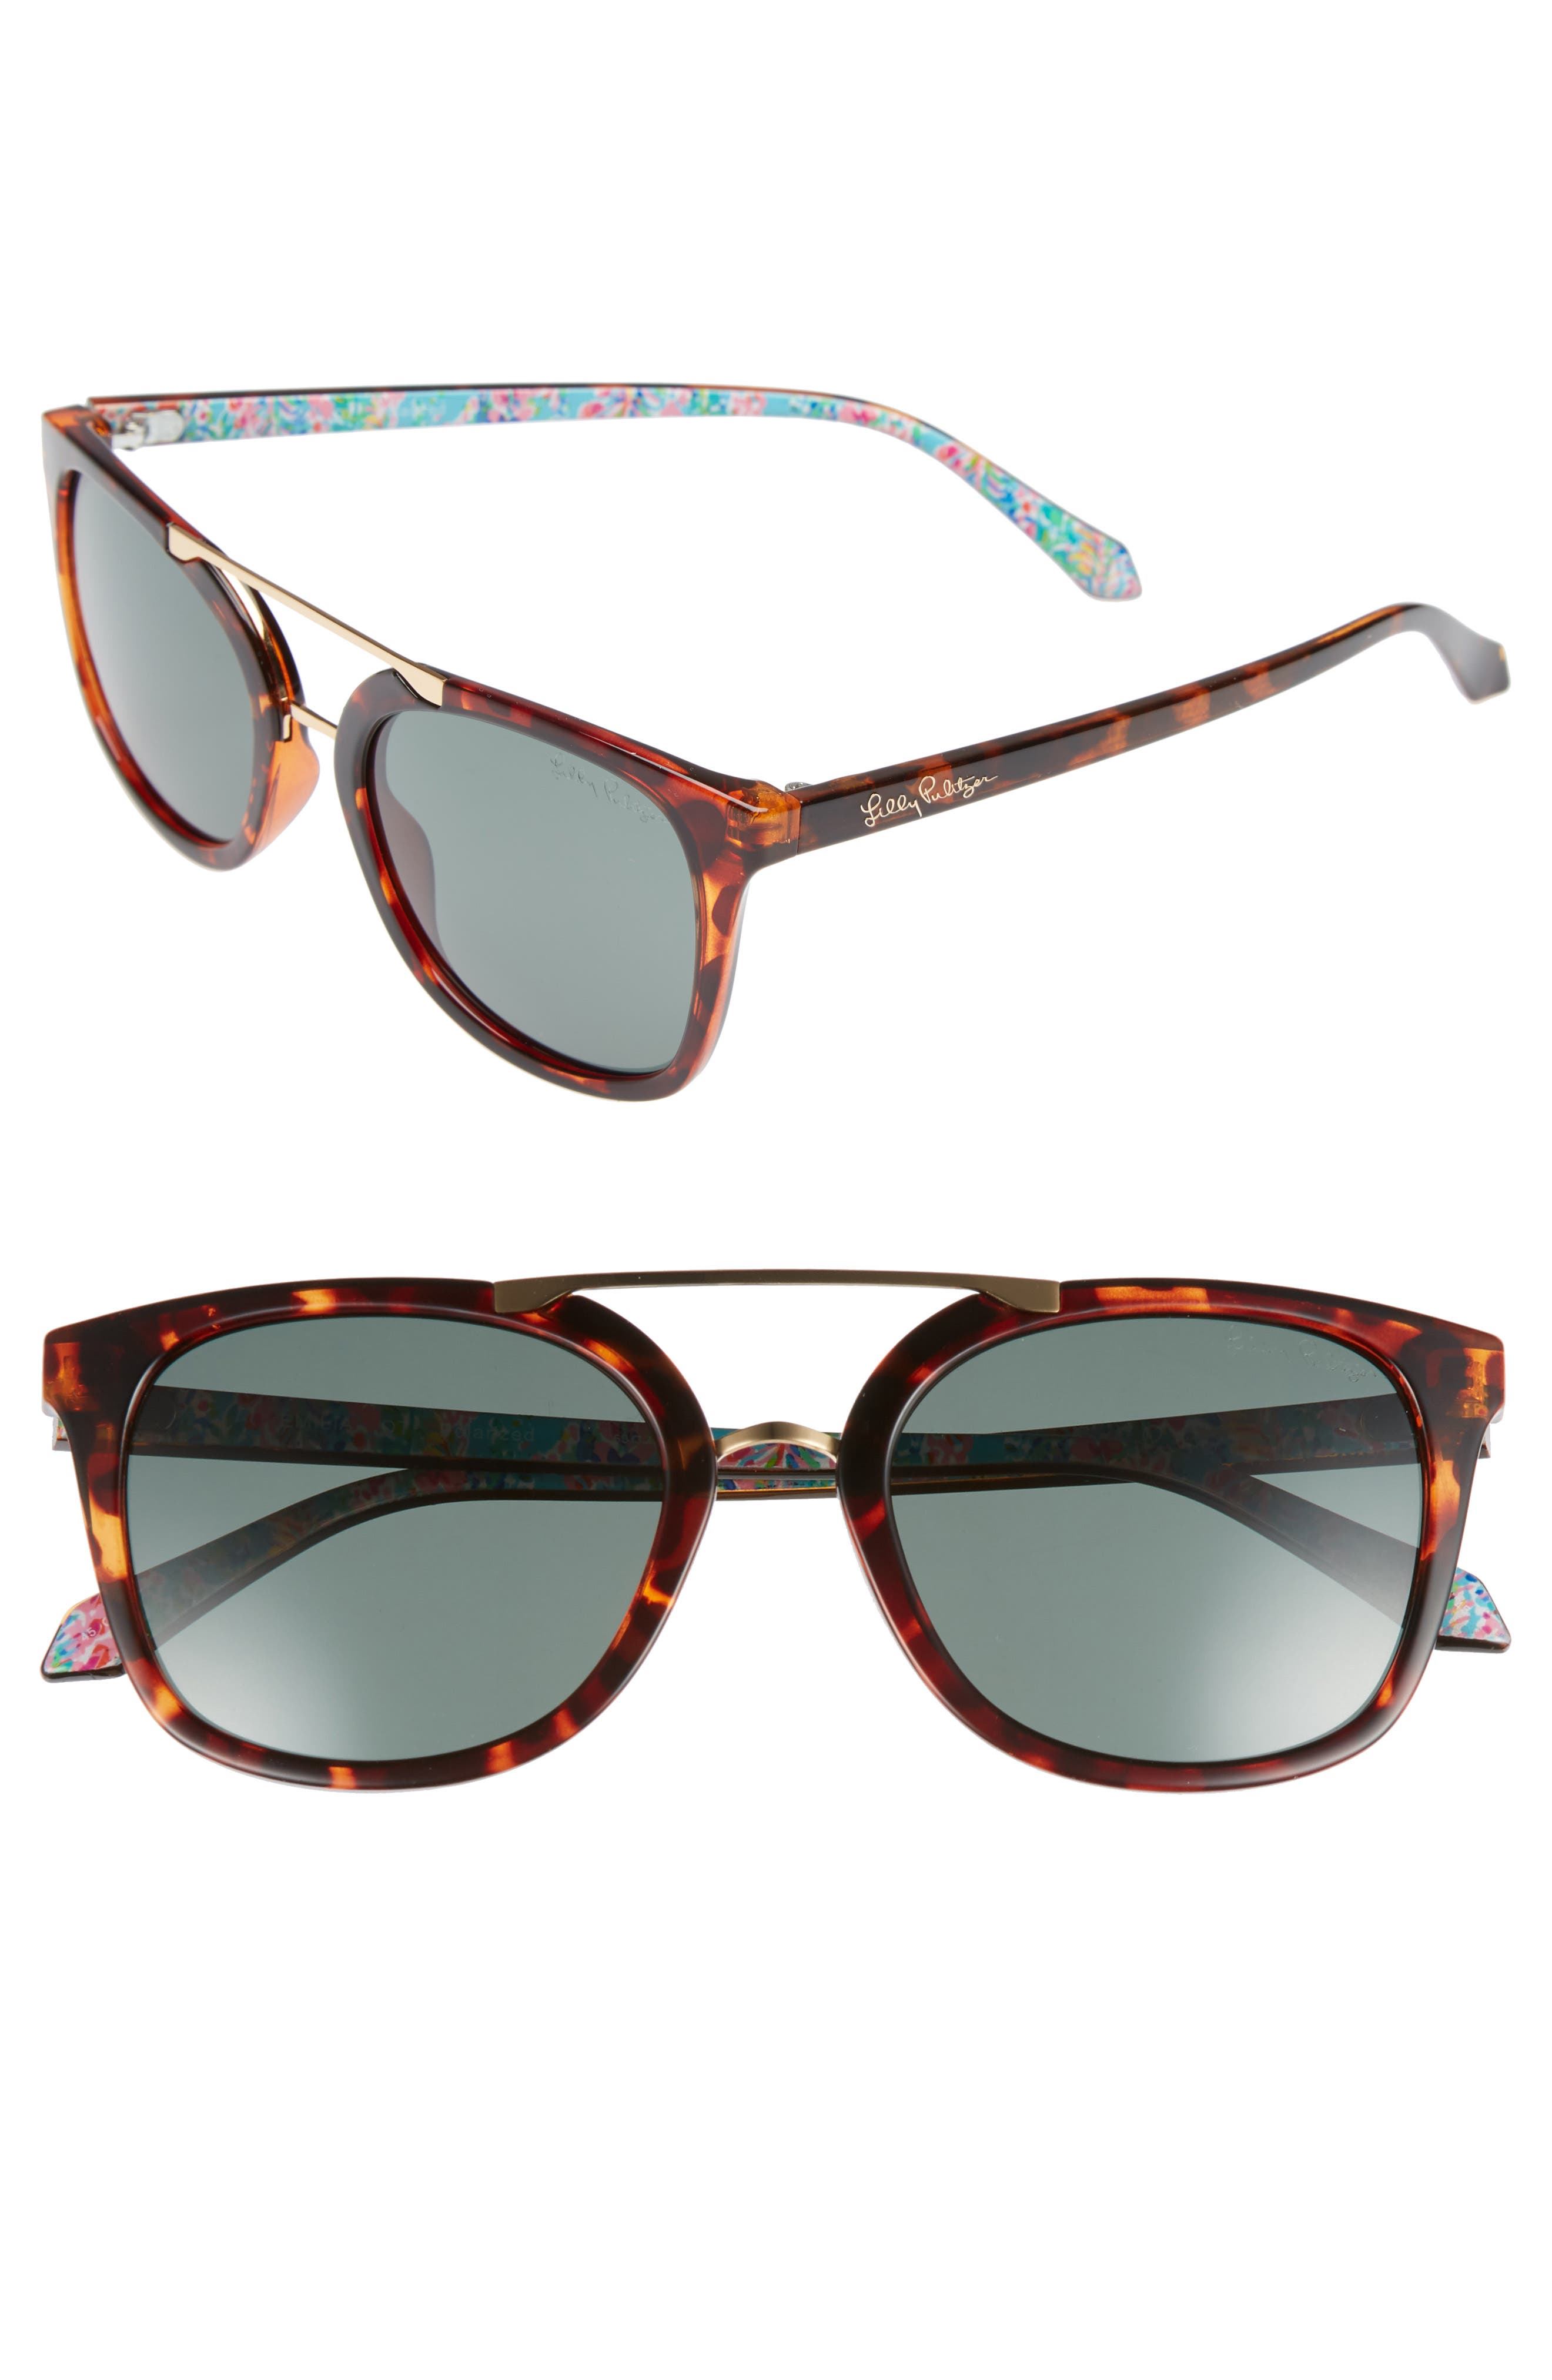 Lilly Pulitzer Emilia 5m Polarized Sunglasses - Dark Tortoise/ Green